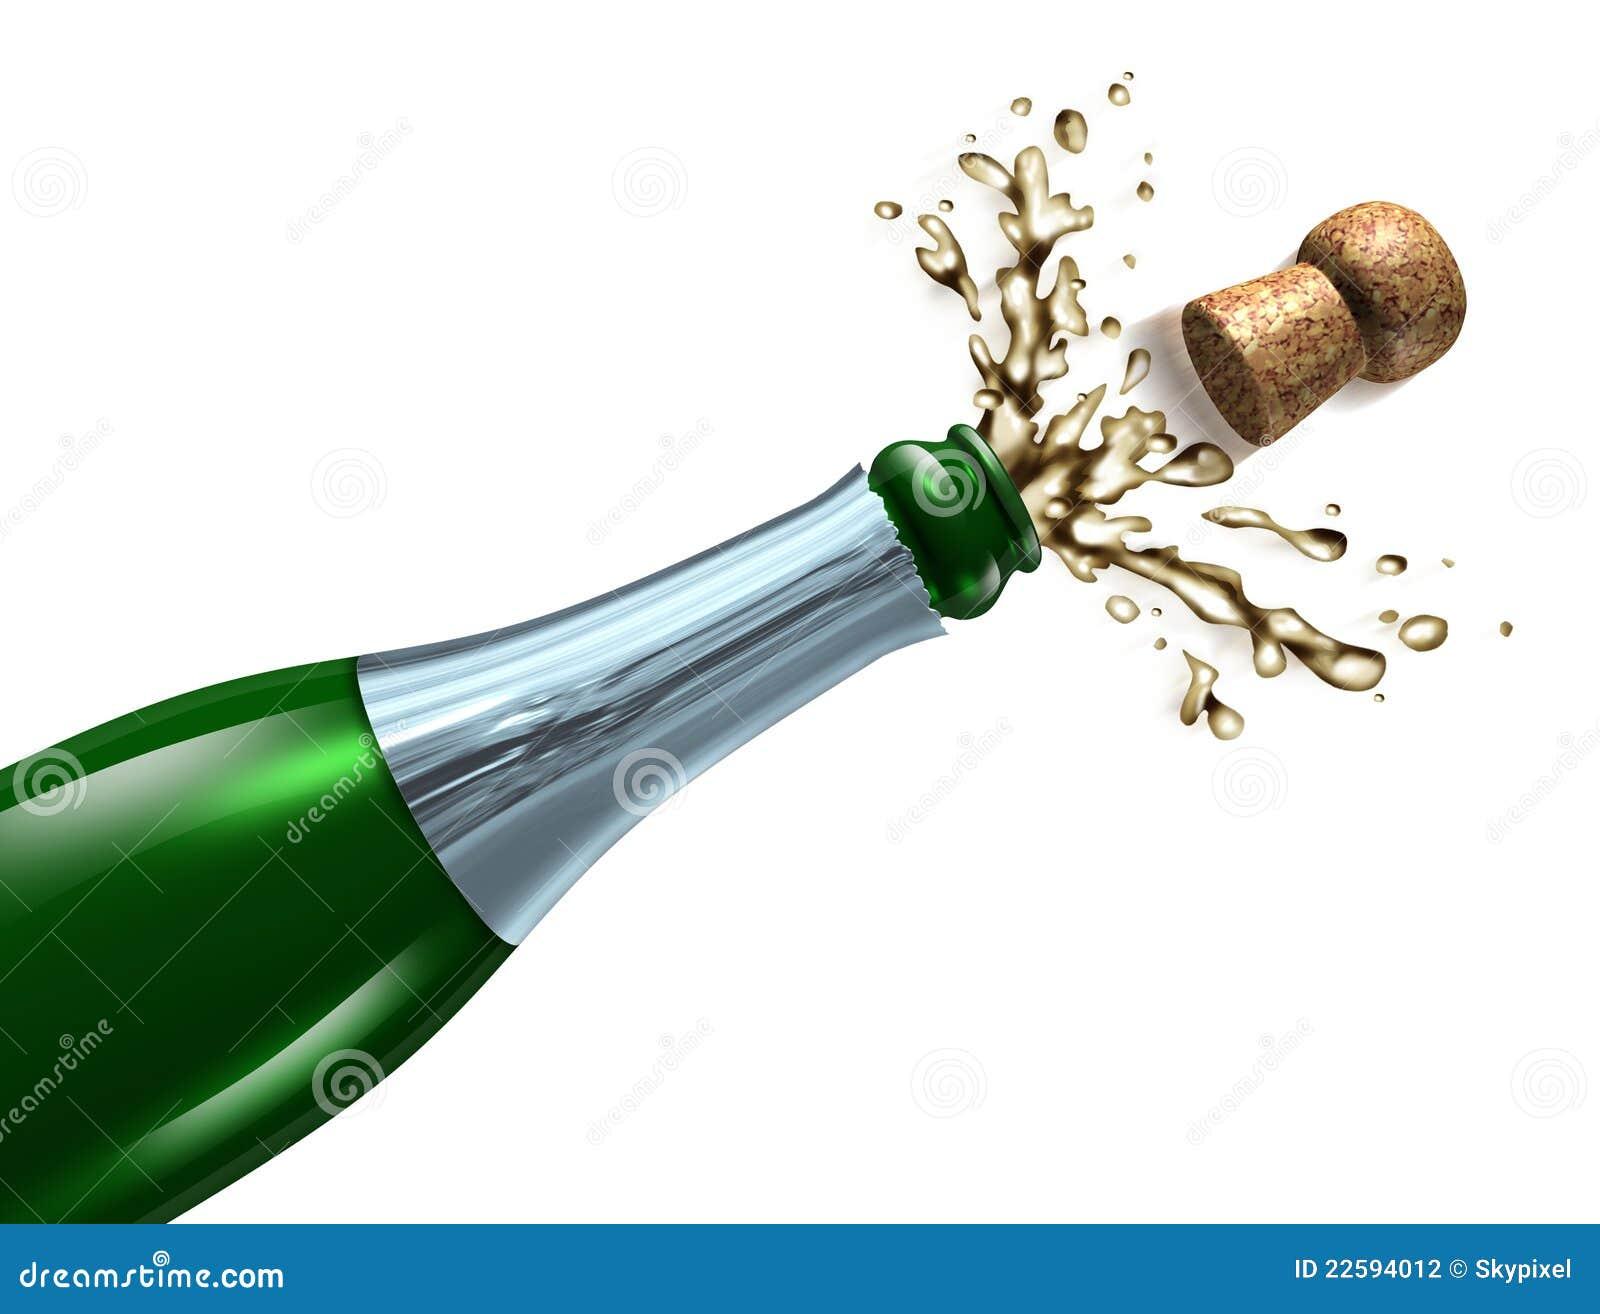 Pop the champagne cork dmvideos